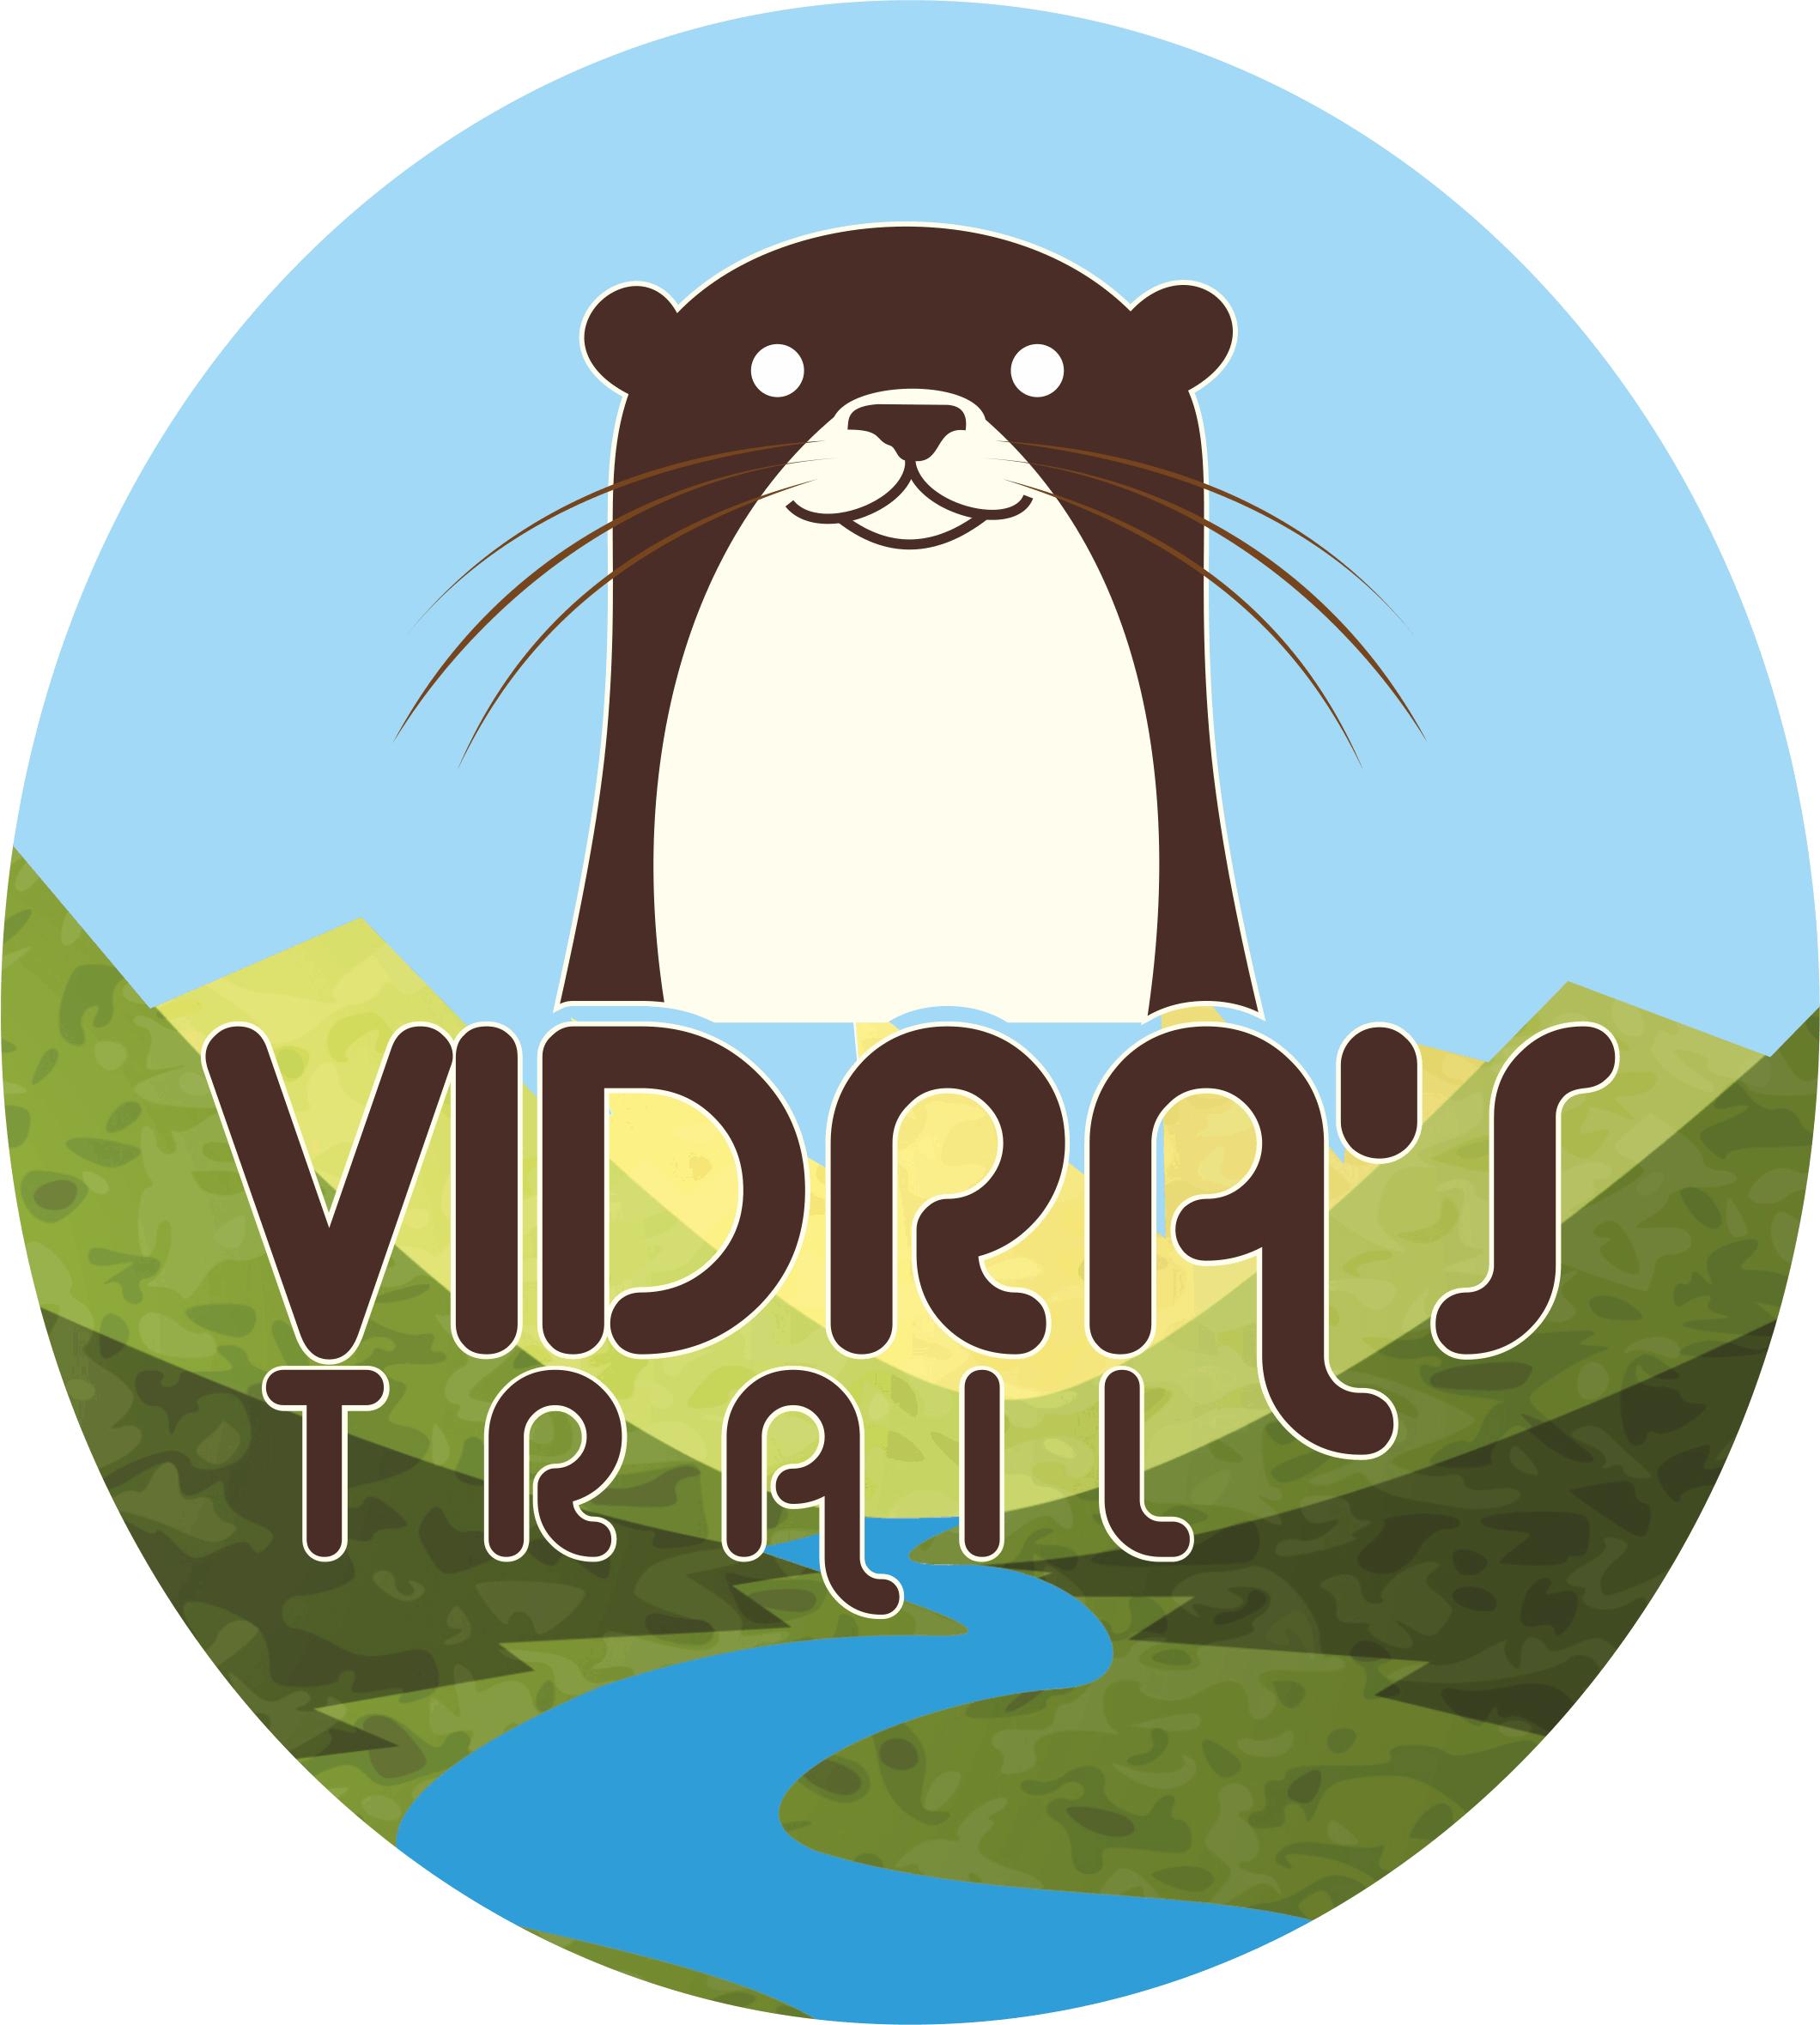 Vidras Trail